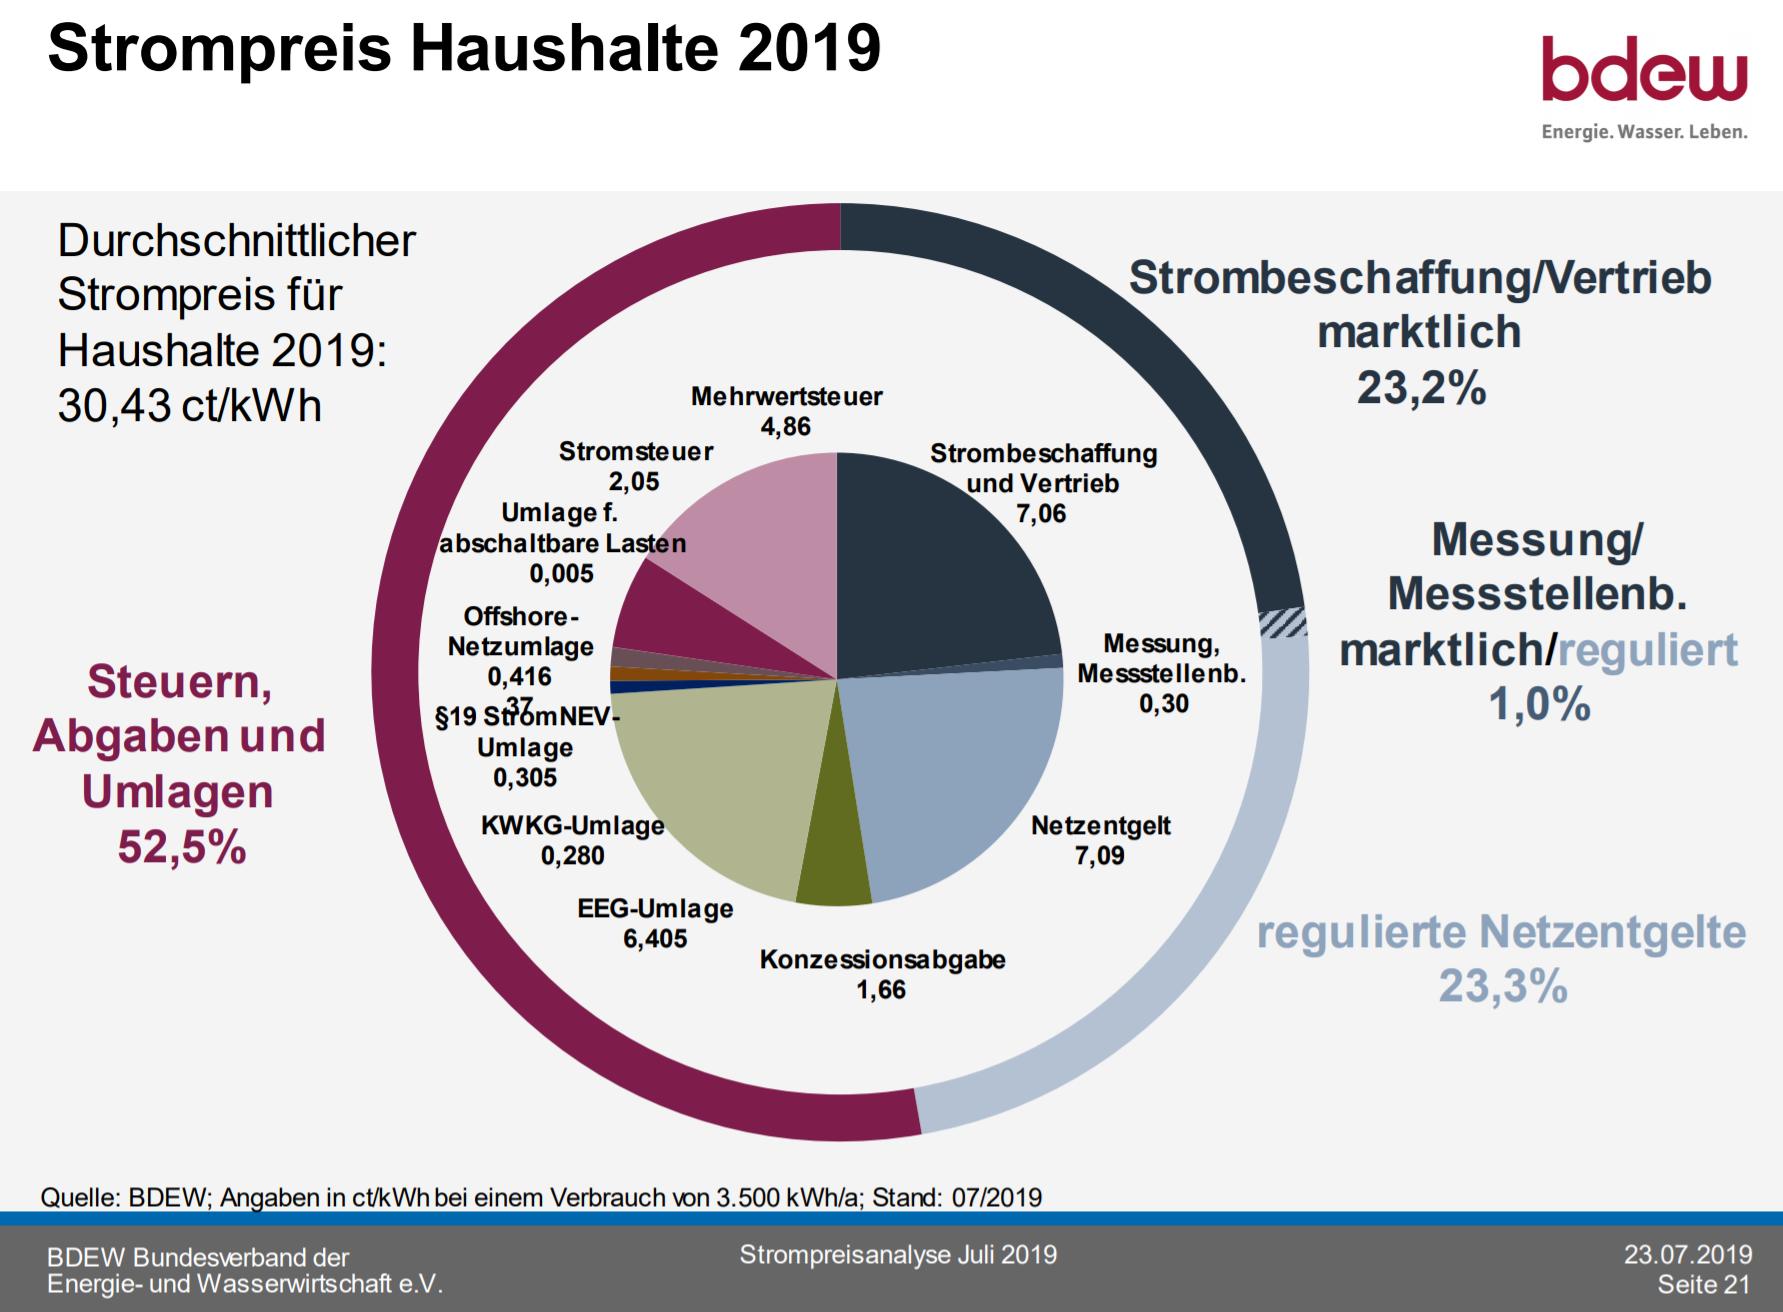 Strompreis Haushalte 2019